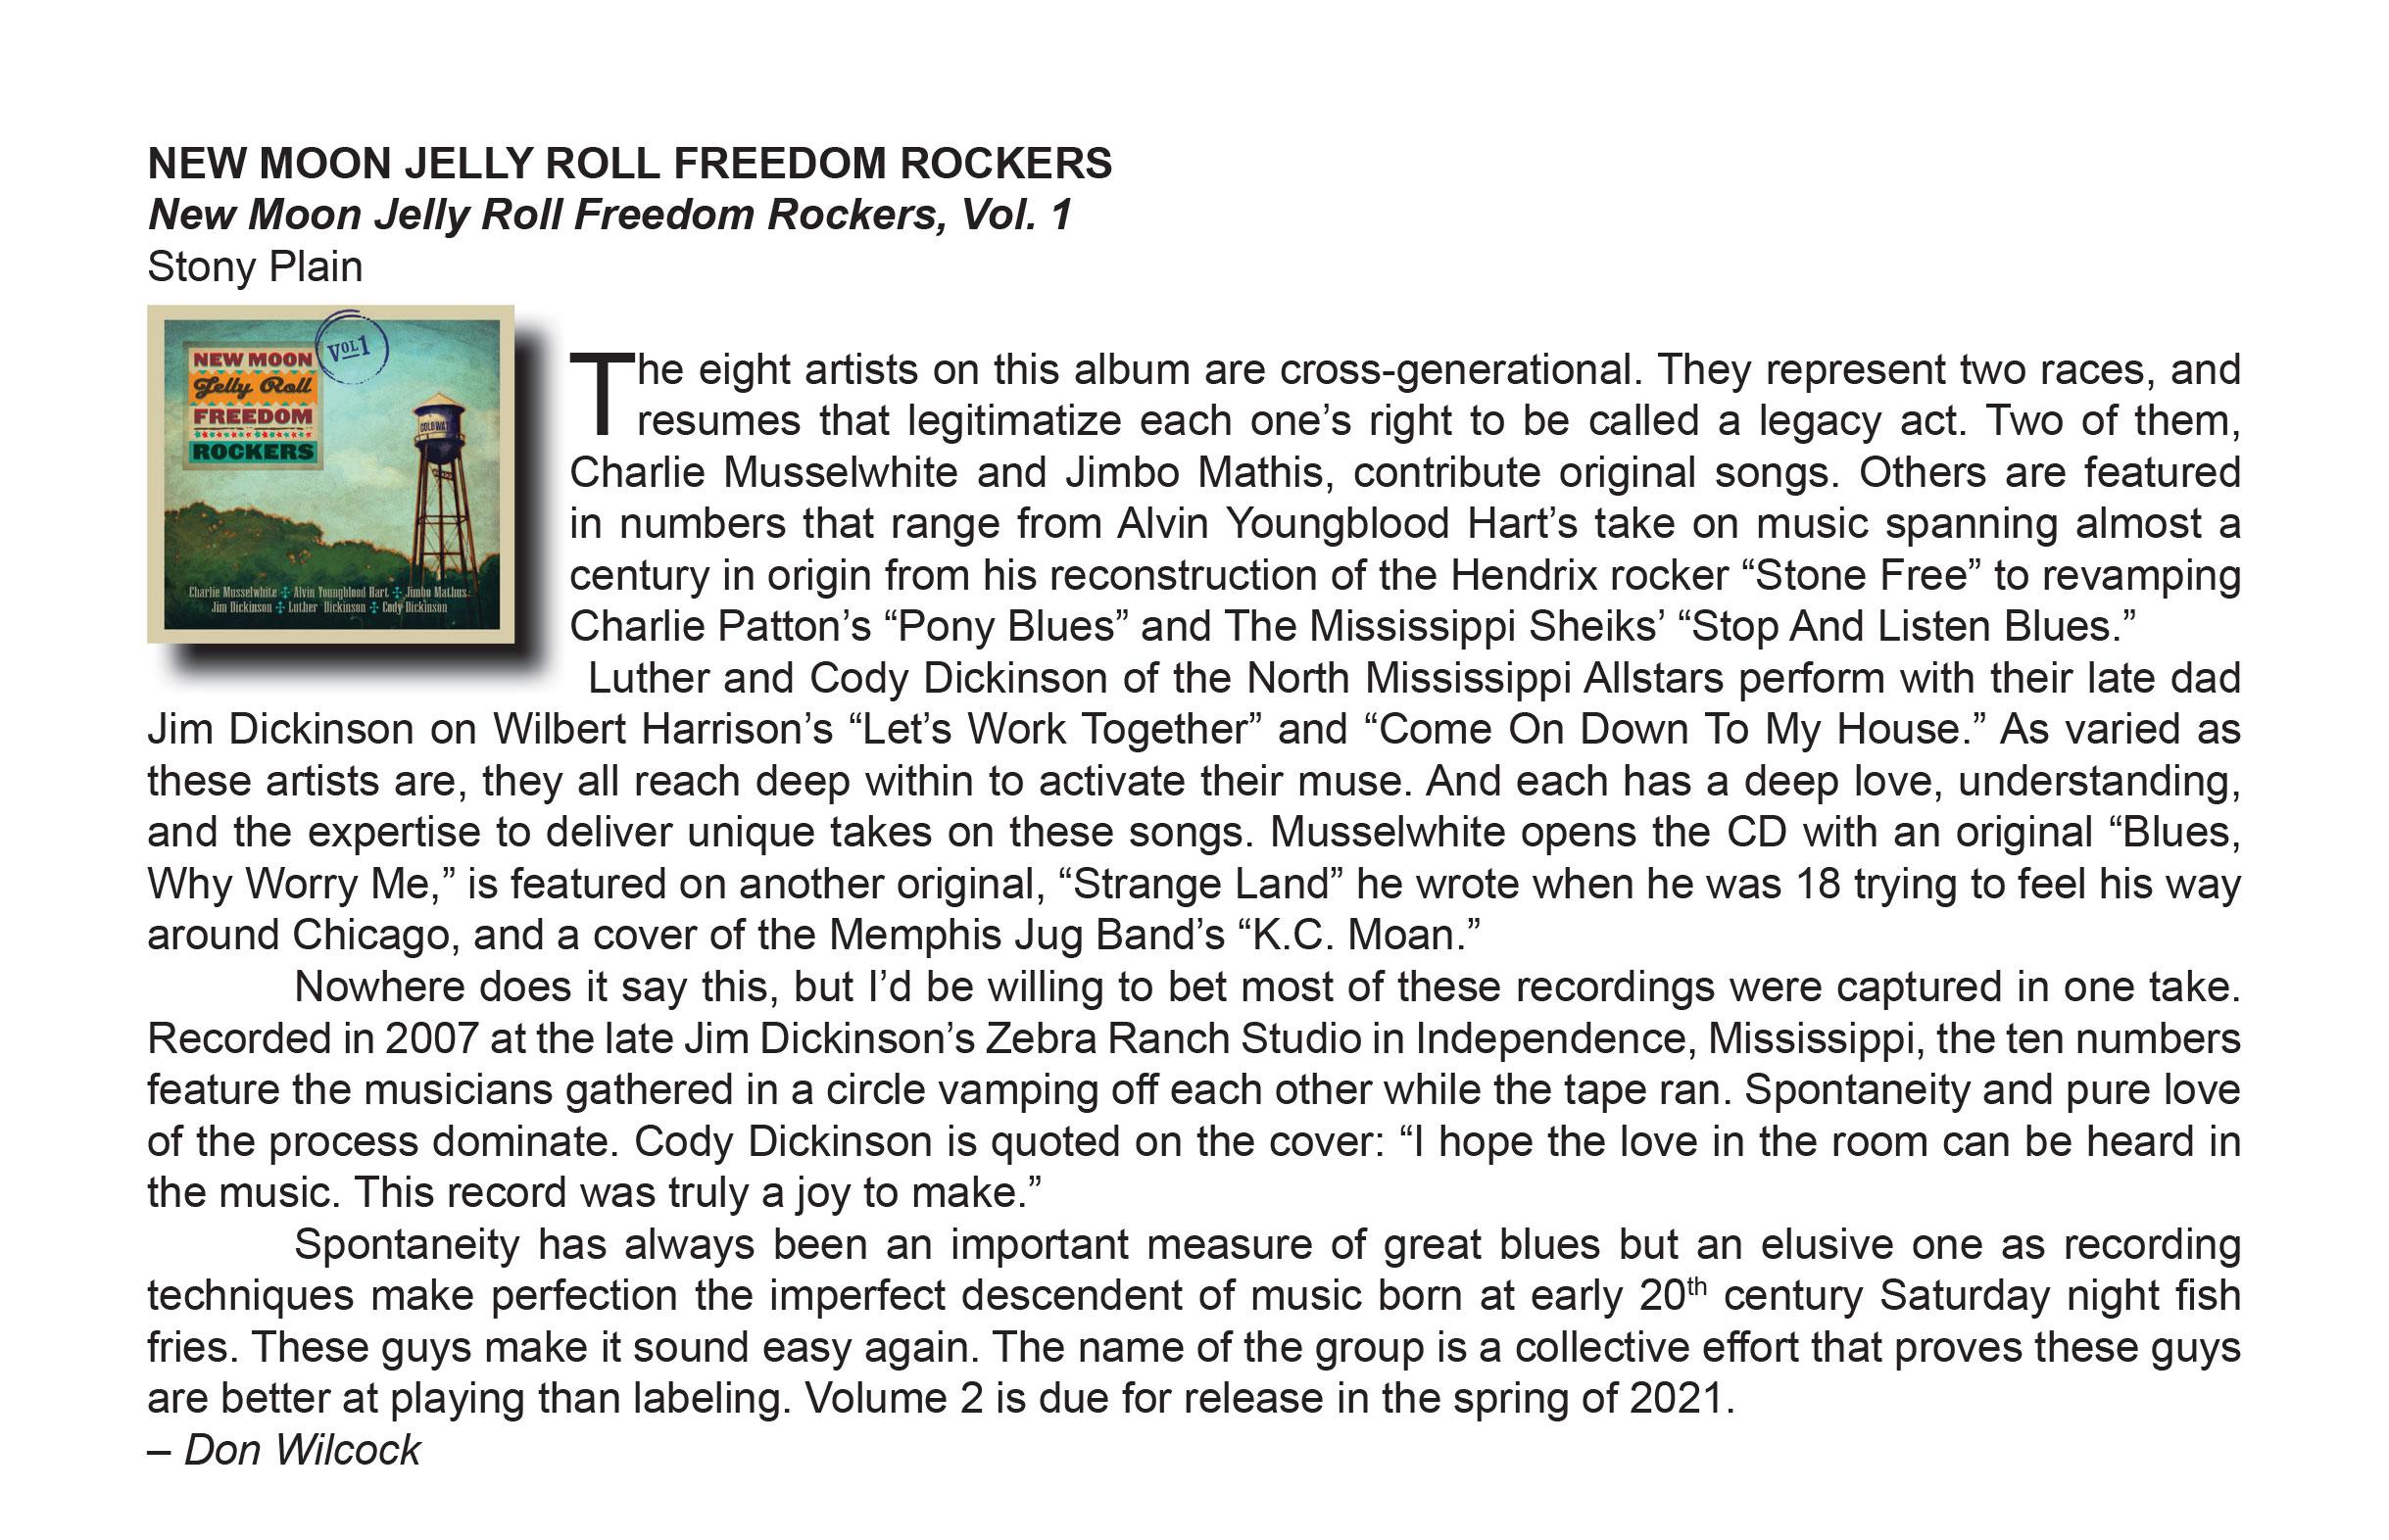 new-moon-freedom-rockers-vol-1.jpg